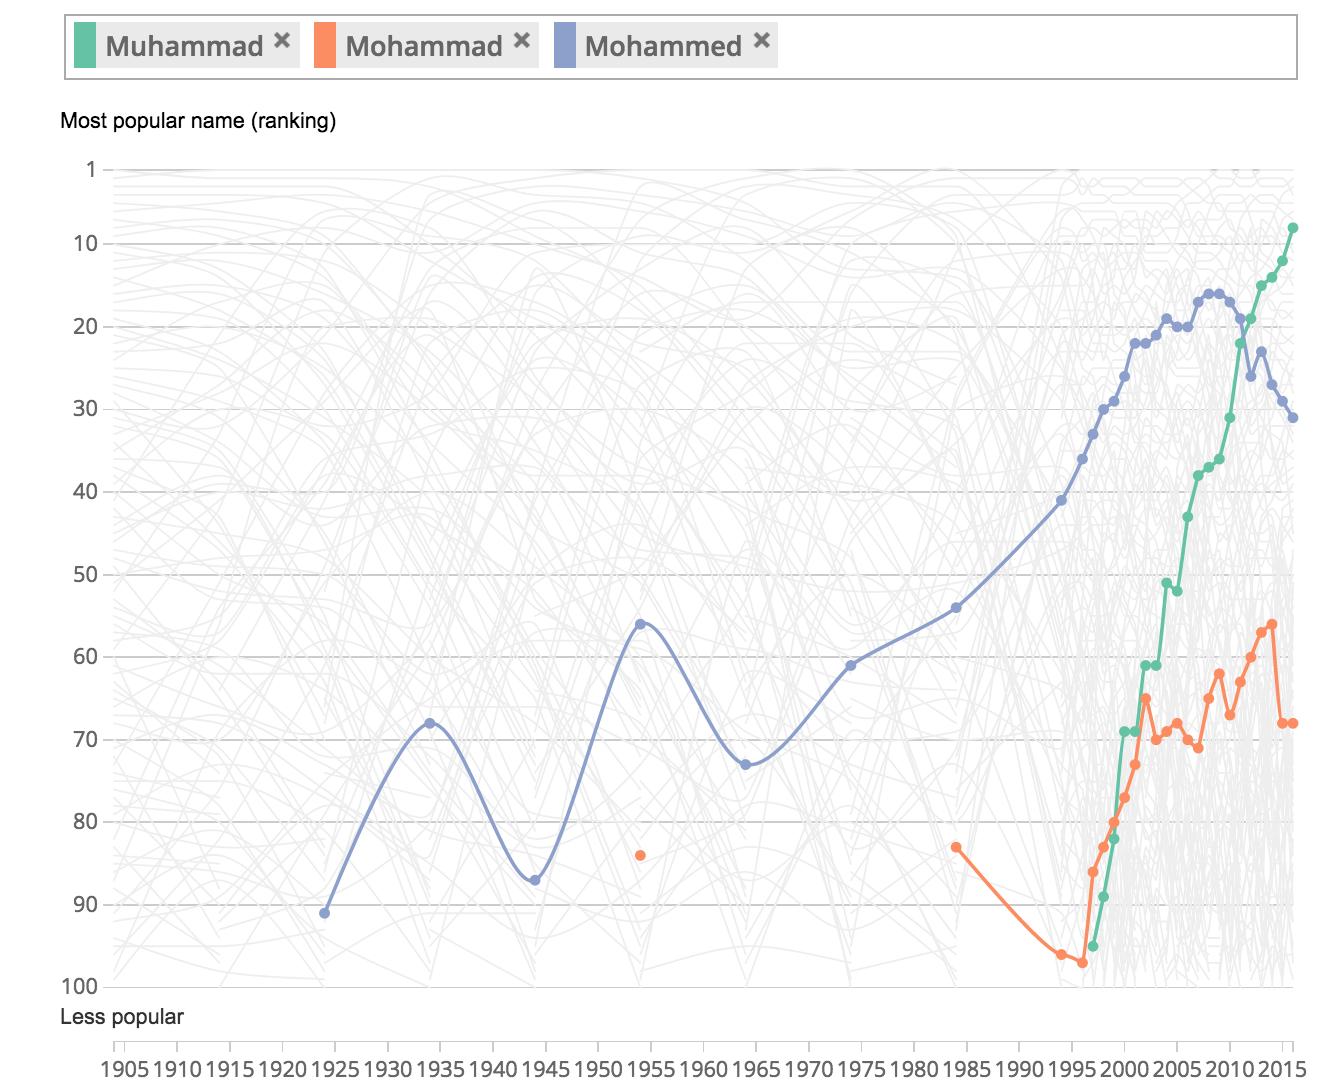 Most Popular Baby Names In UK: Muhammad Cracks Top 10 | Fortune